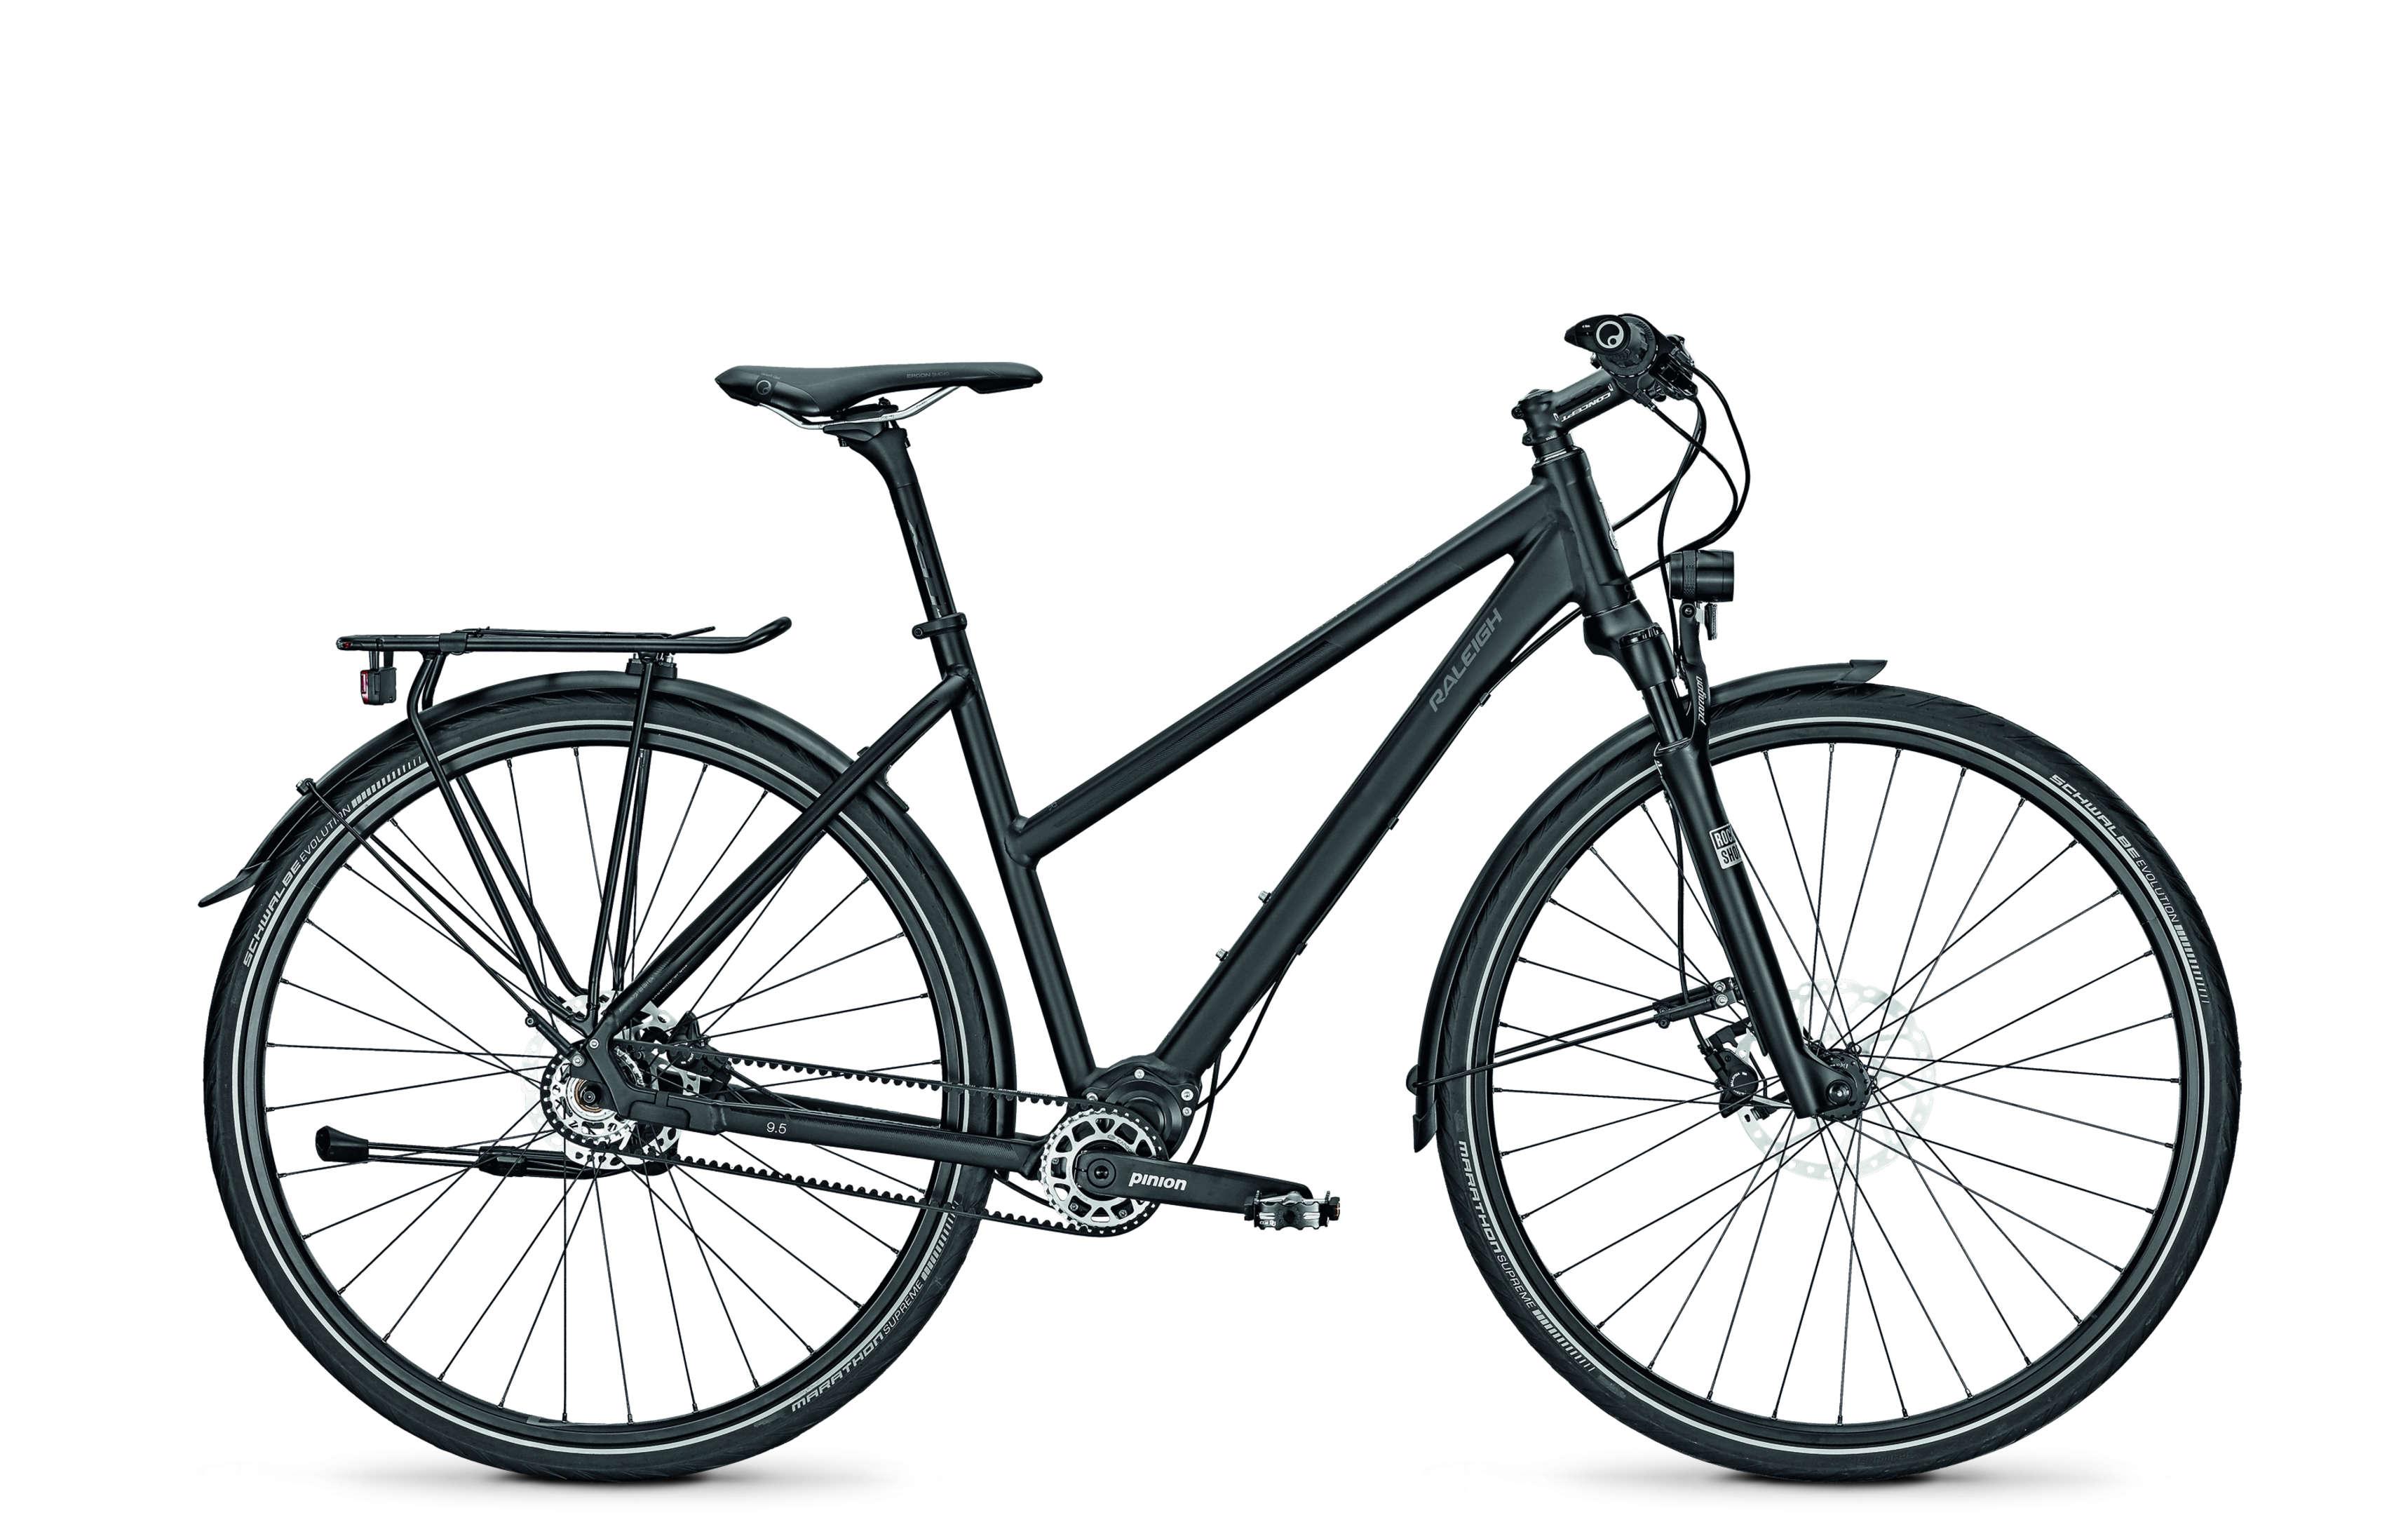 raleigh trekkingrad rushhour 9 5 12g 2017 eurorad bikeleasingeurorad bikeleasing. Black Bedroom Furniture Sets. Home Design Ideas